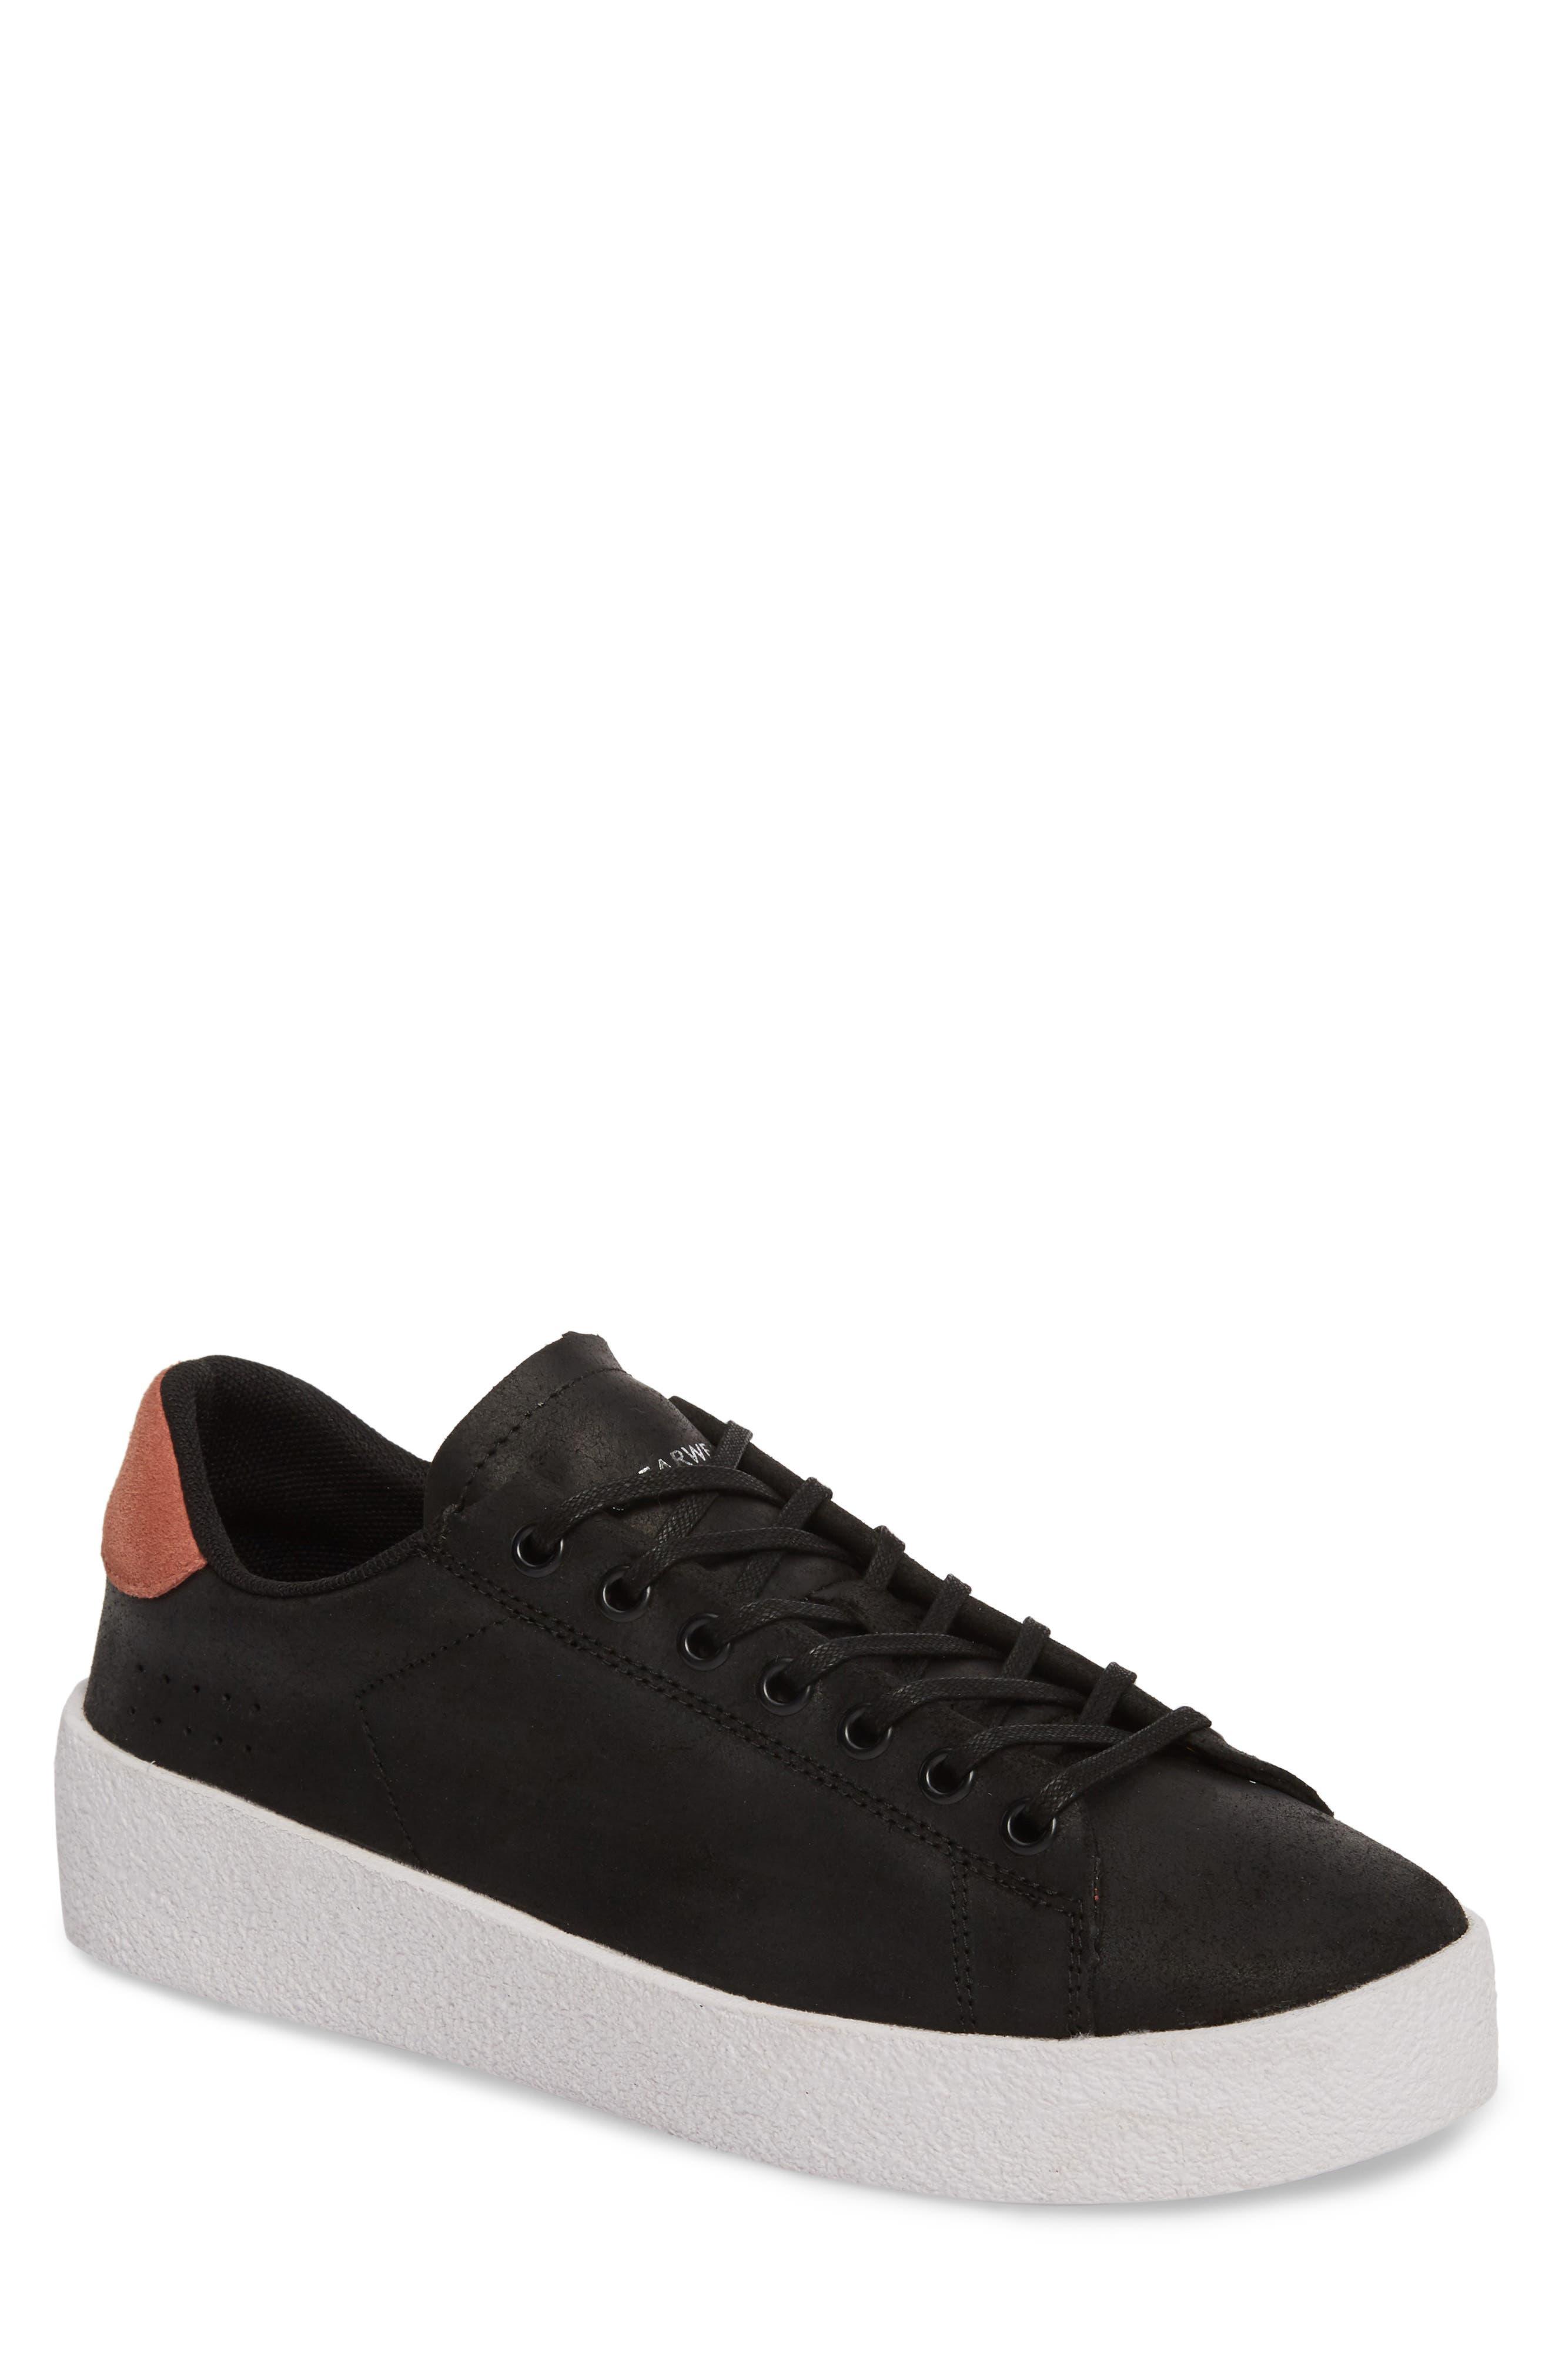 Jones Platform Sneaker,                             Main thumbnail 1, color,                             Black Leather